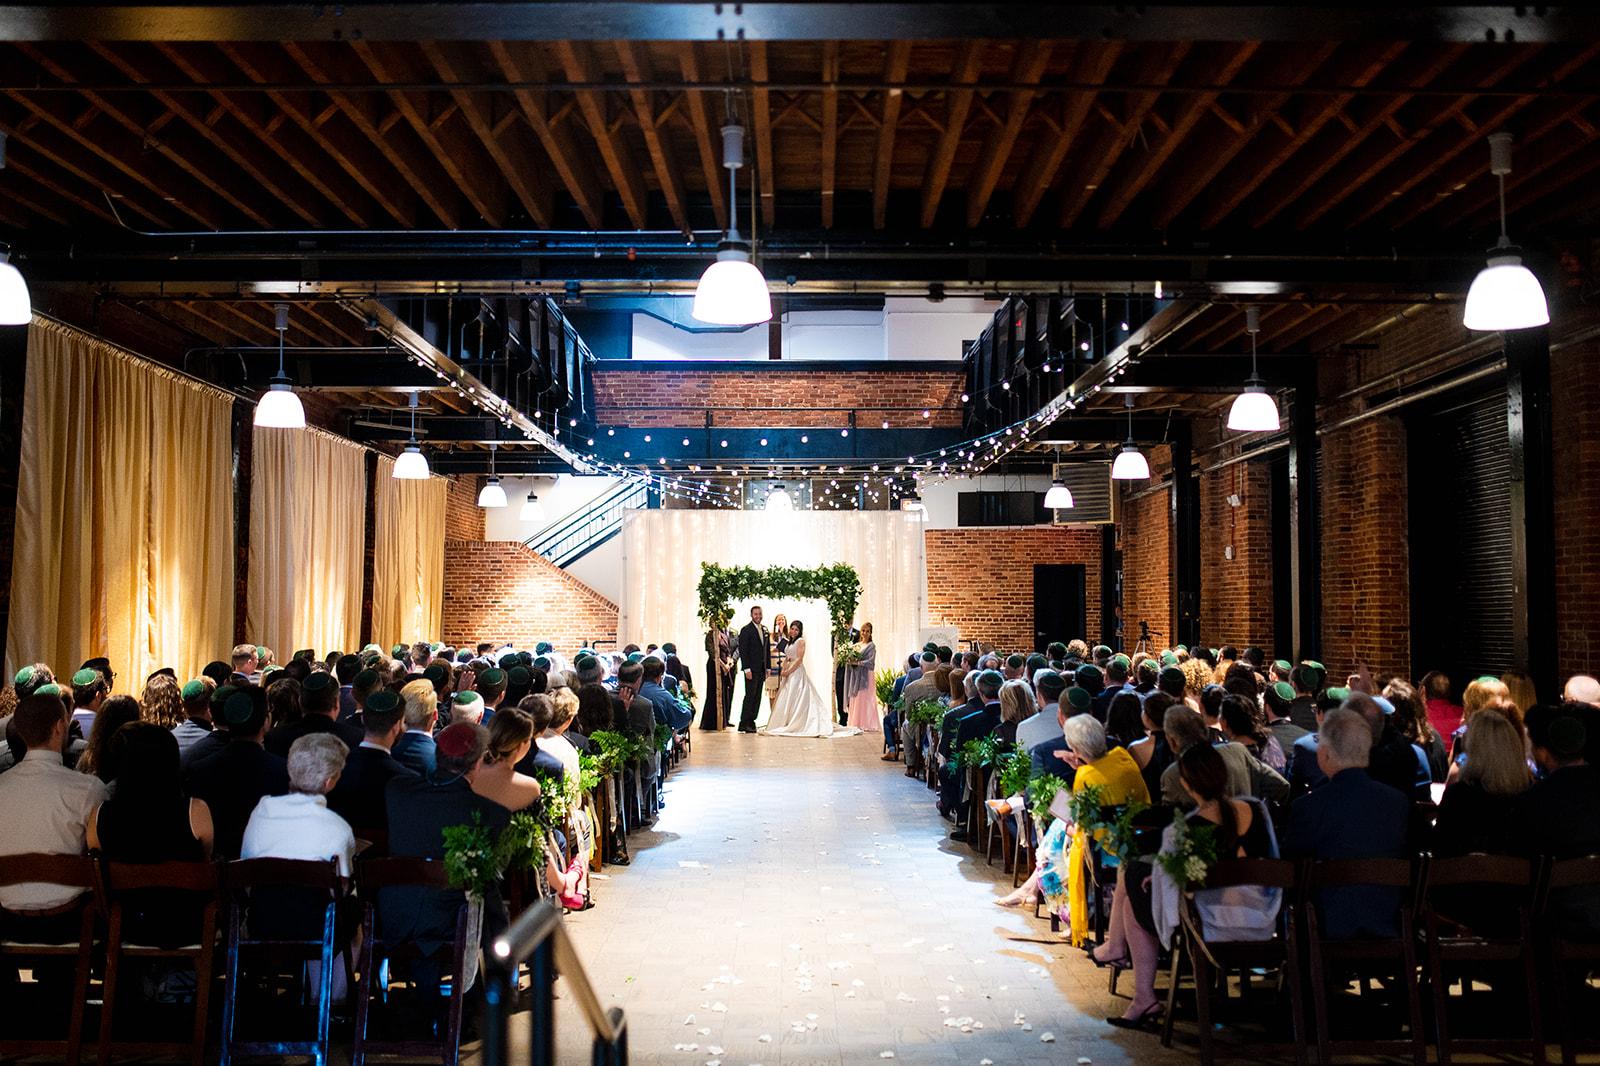 The_best_of_the_best_wedding_photographer_Mantas_Kubilinskas-460.jpg